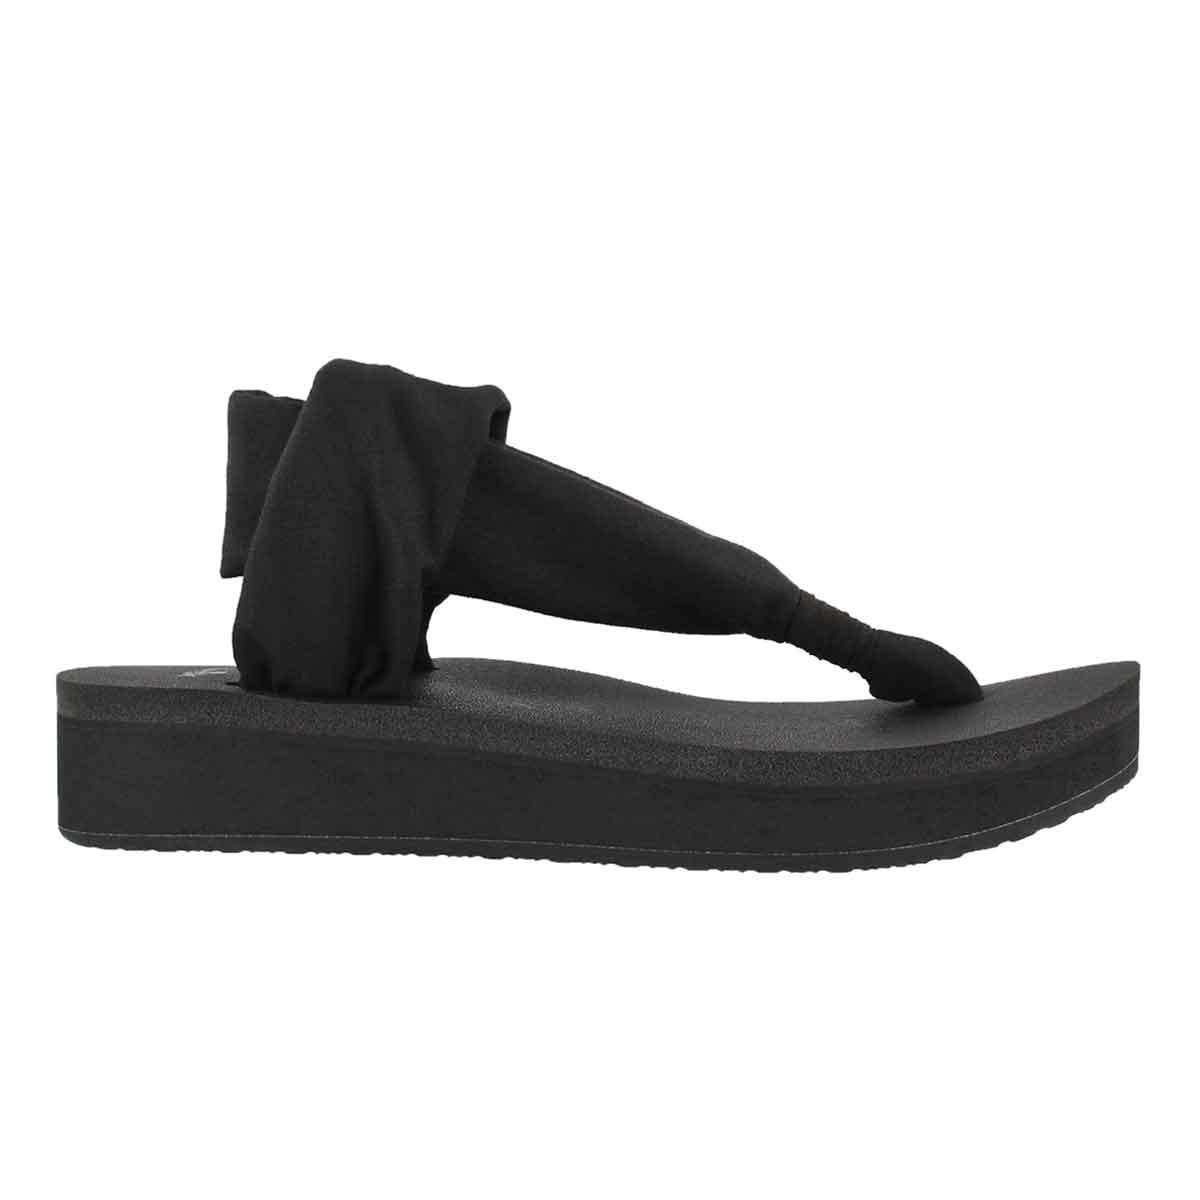 Women's YOGA SLING black thong wedge sandals